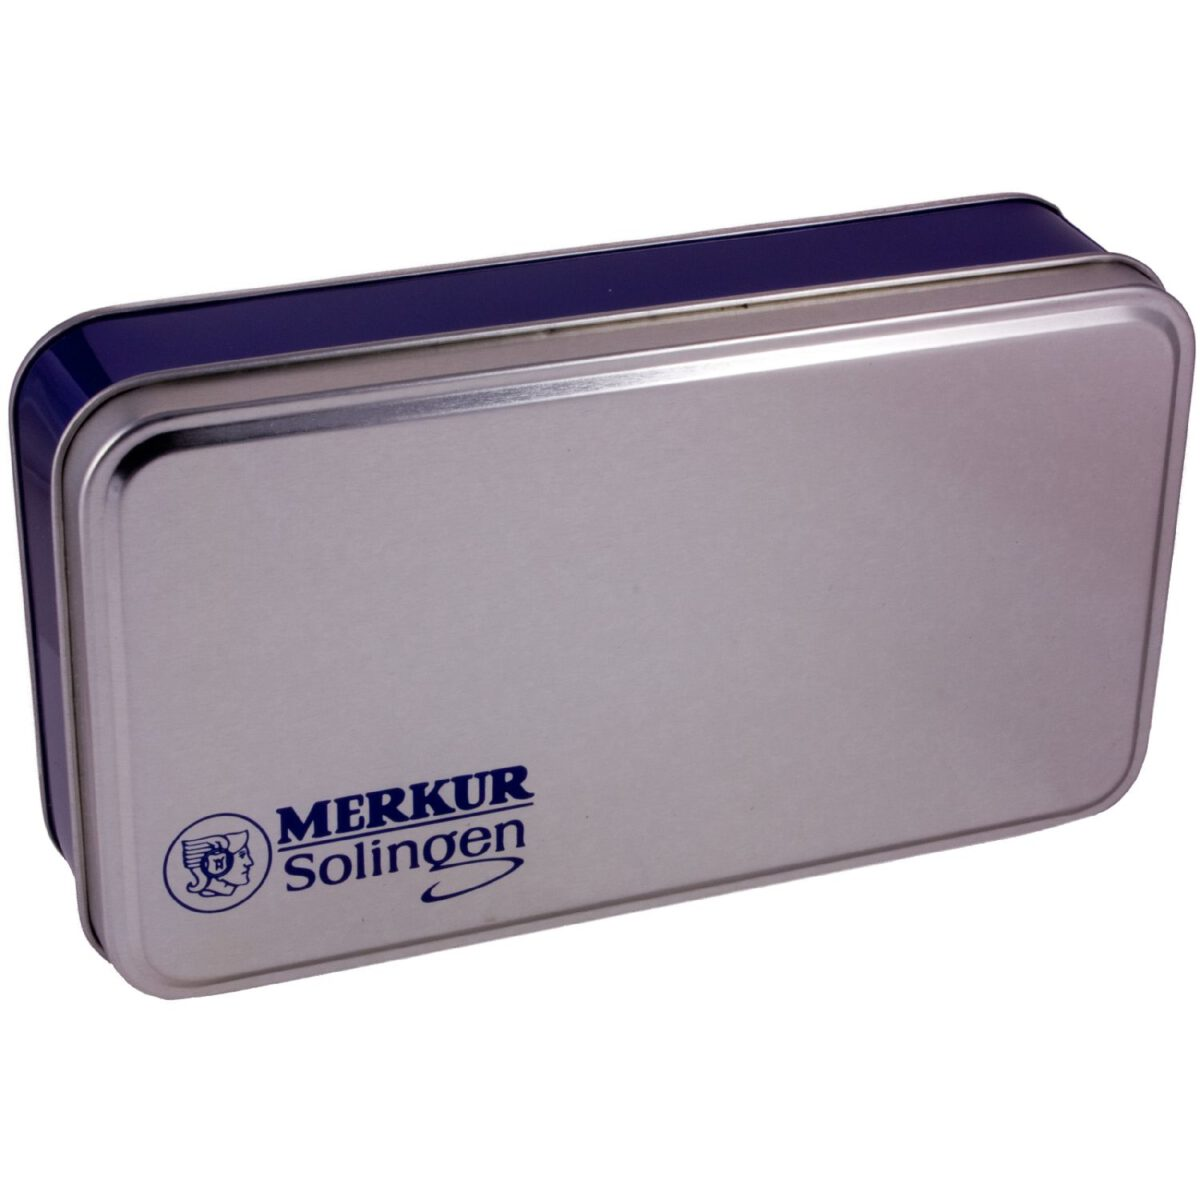 Merkur Futur Adjustable Safety Razor Gift Tin & Blades - Polished-2497